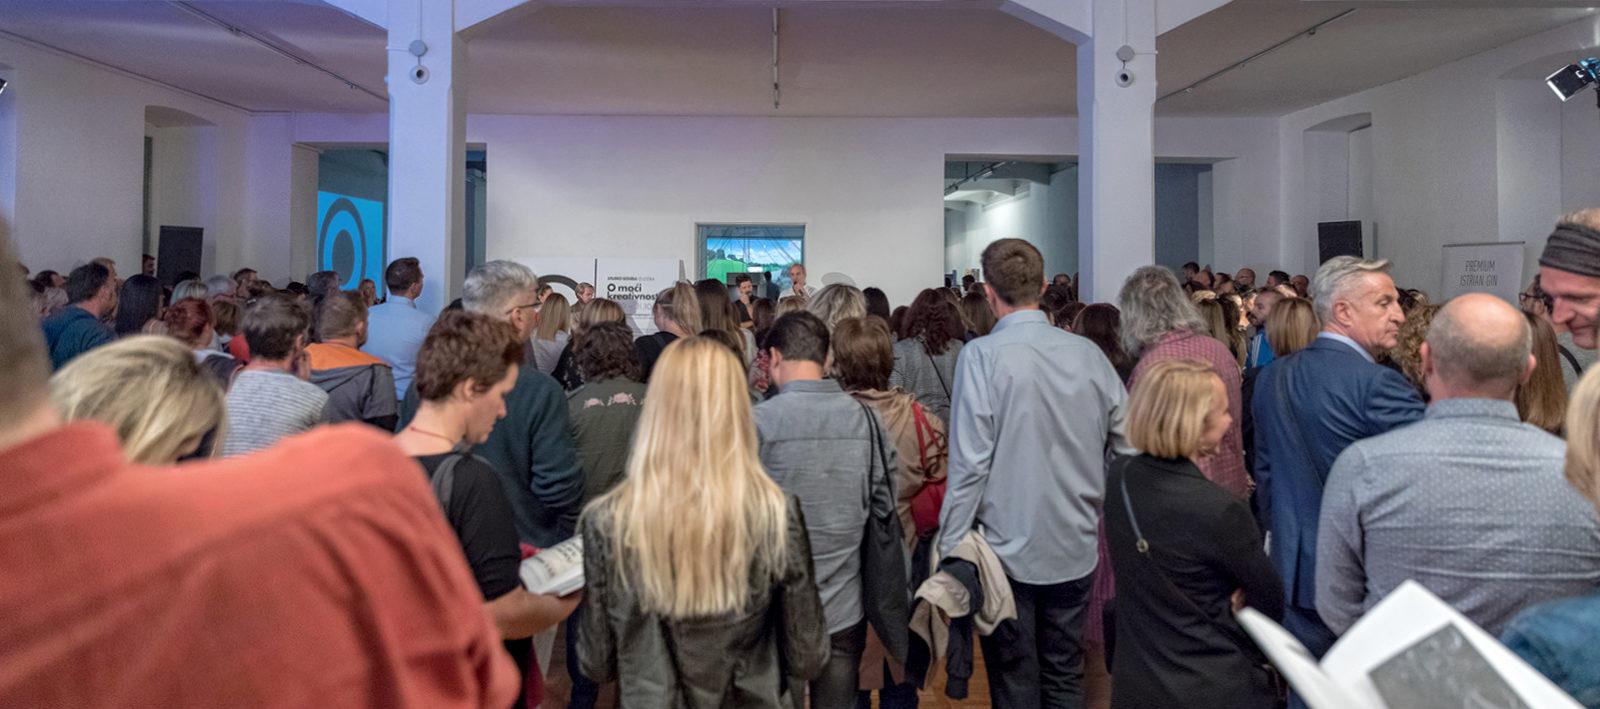 Opening of the Sonda exhibition @MCAI